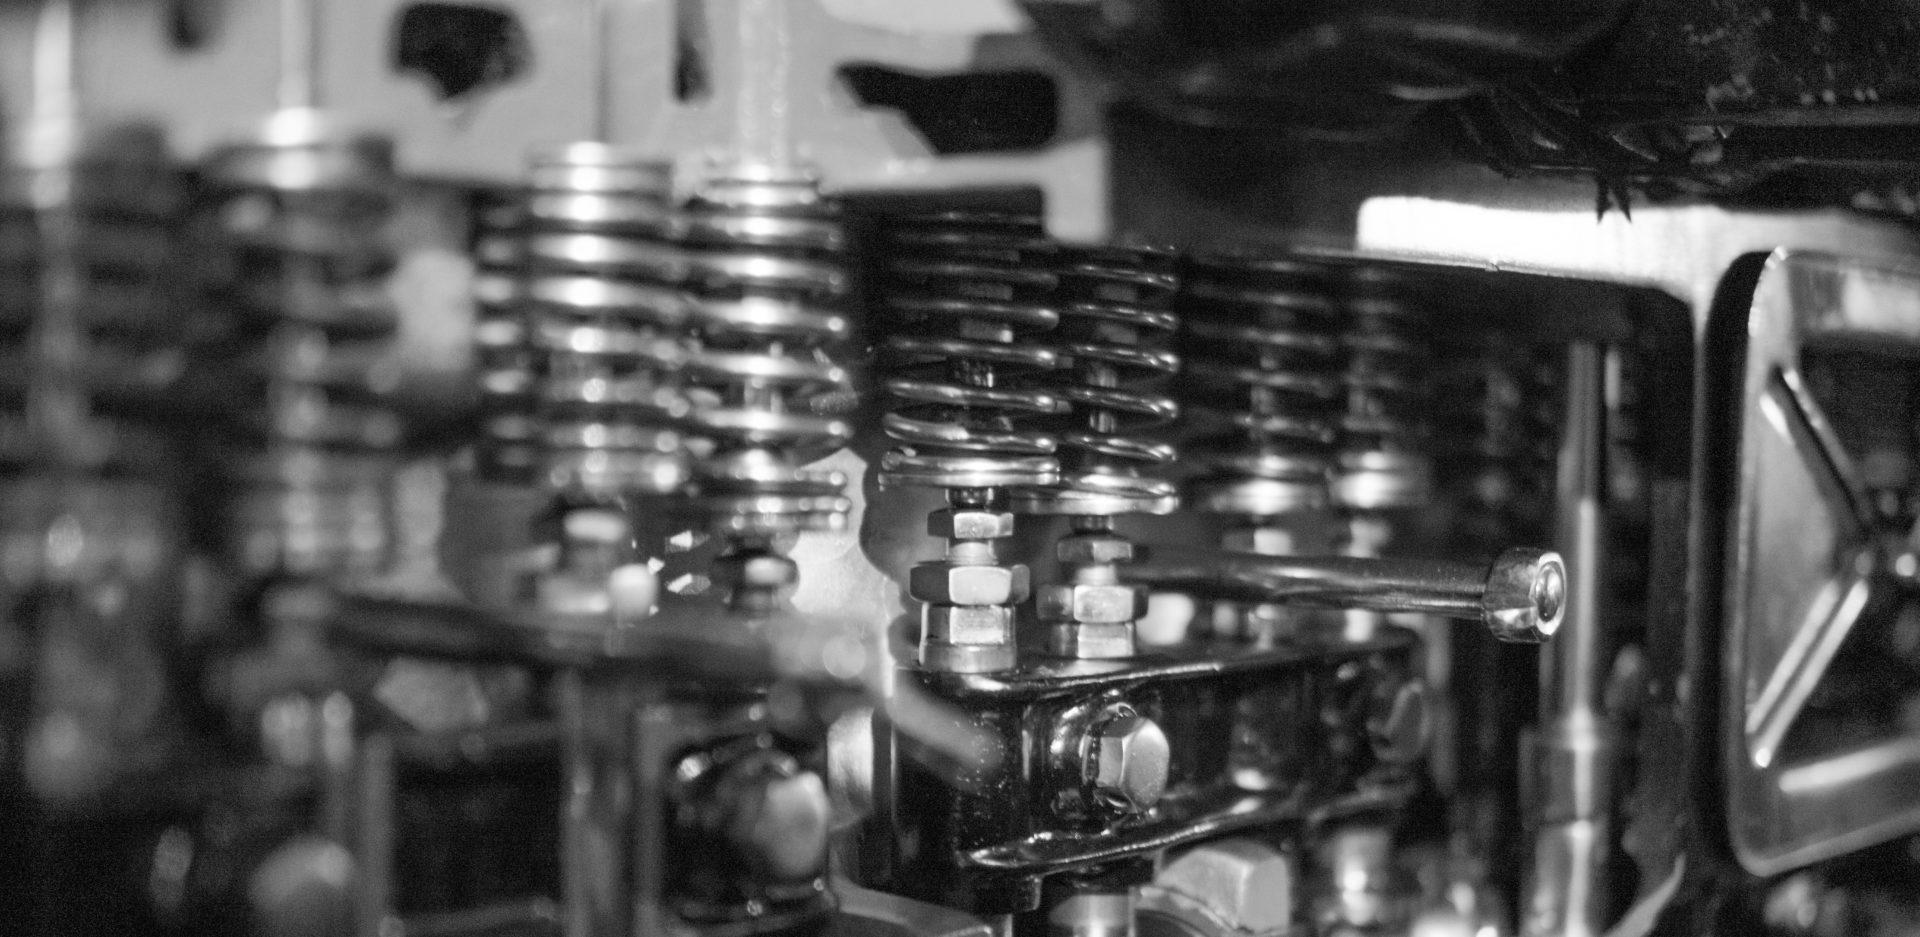 Diesel servis Jelen – Delphi, Stanadyne, Zexel, Motorpal